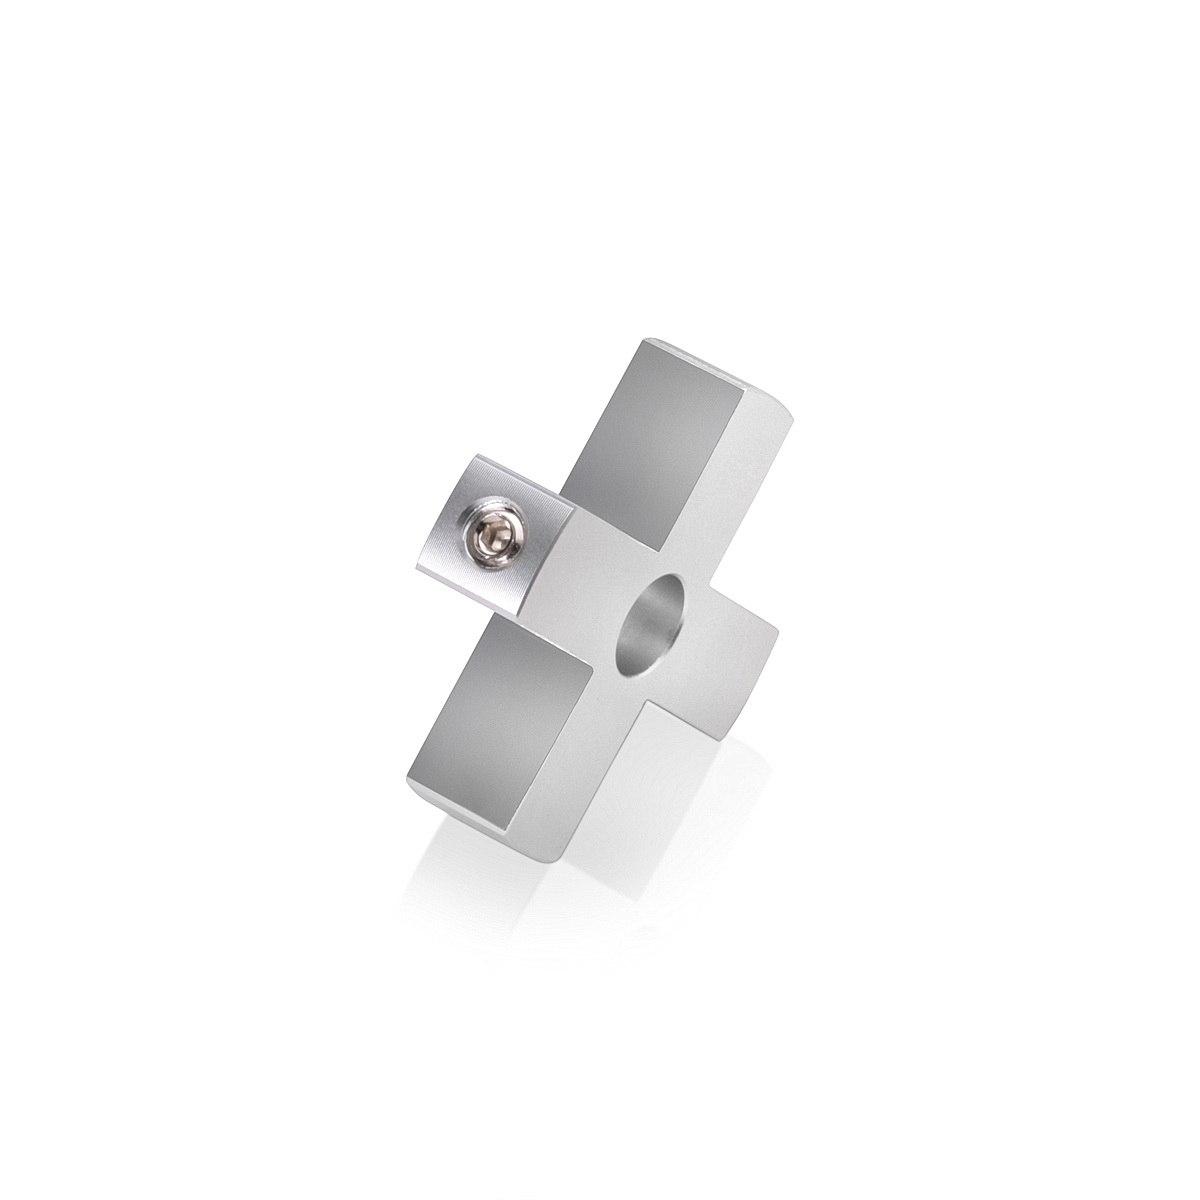 4-Way Standoffs Hub, Diameter: 1 1/2'', Thickness: 3/8'', Clear Anodized Aluminum